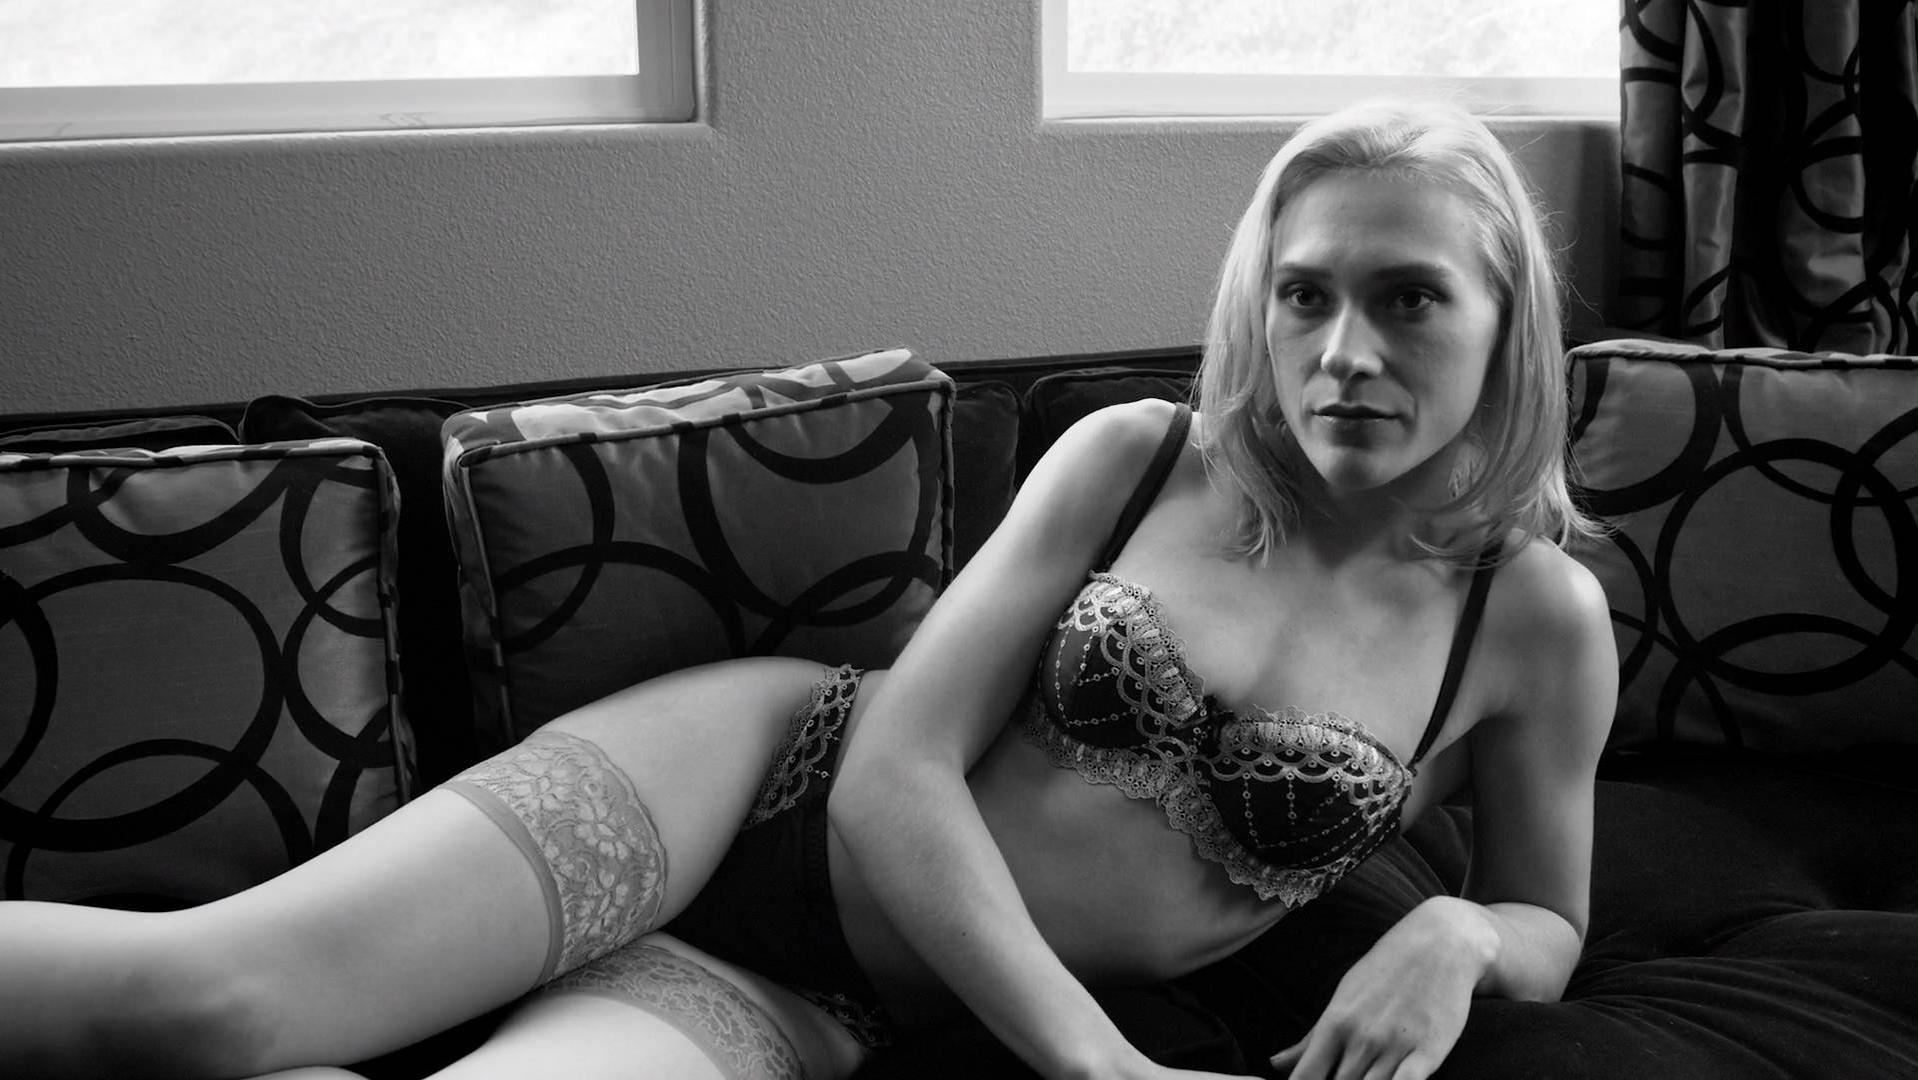 Sydney Black sexy - Secrets of Deception (2017)